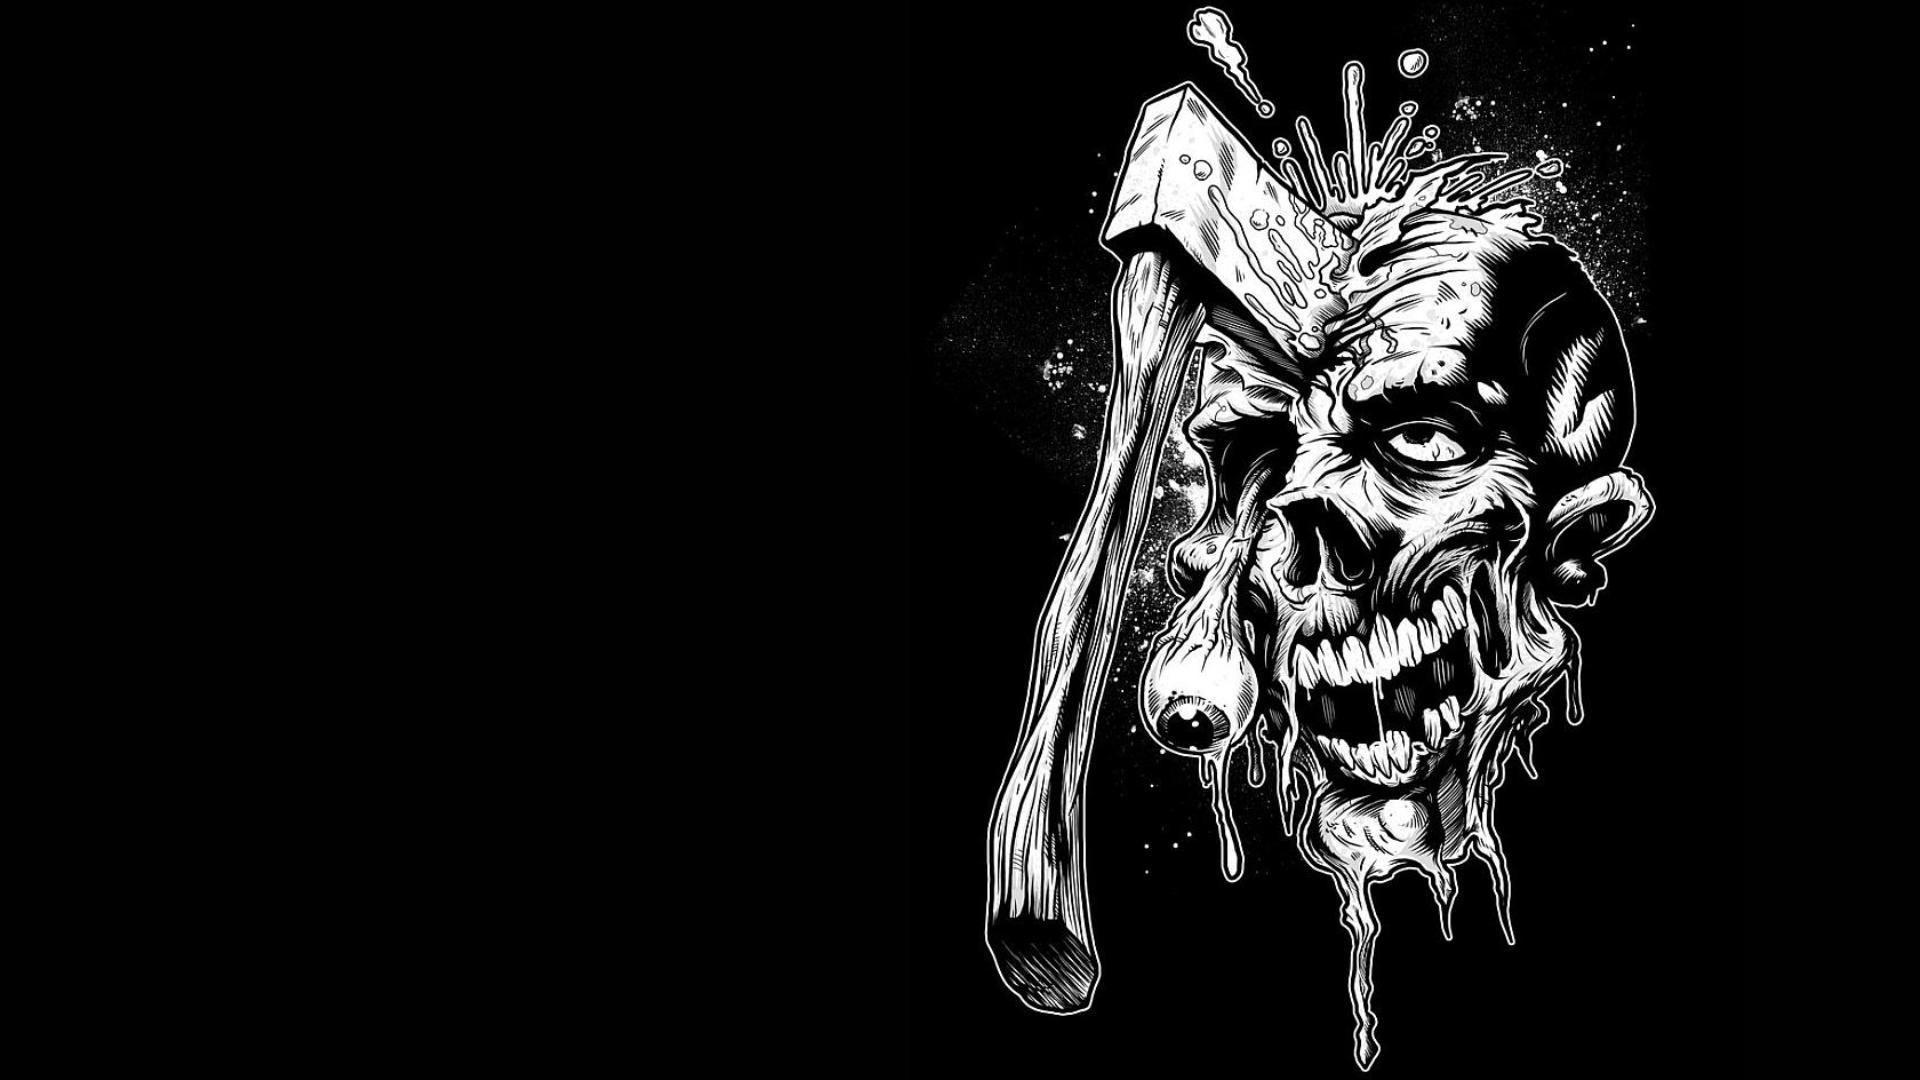 Dark Creepy Wallpaper Zombie Wallpaper Skull Wallpaper Zombie Background